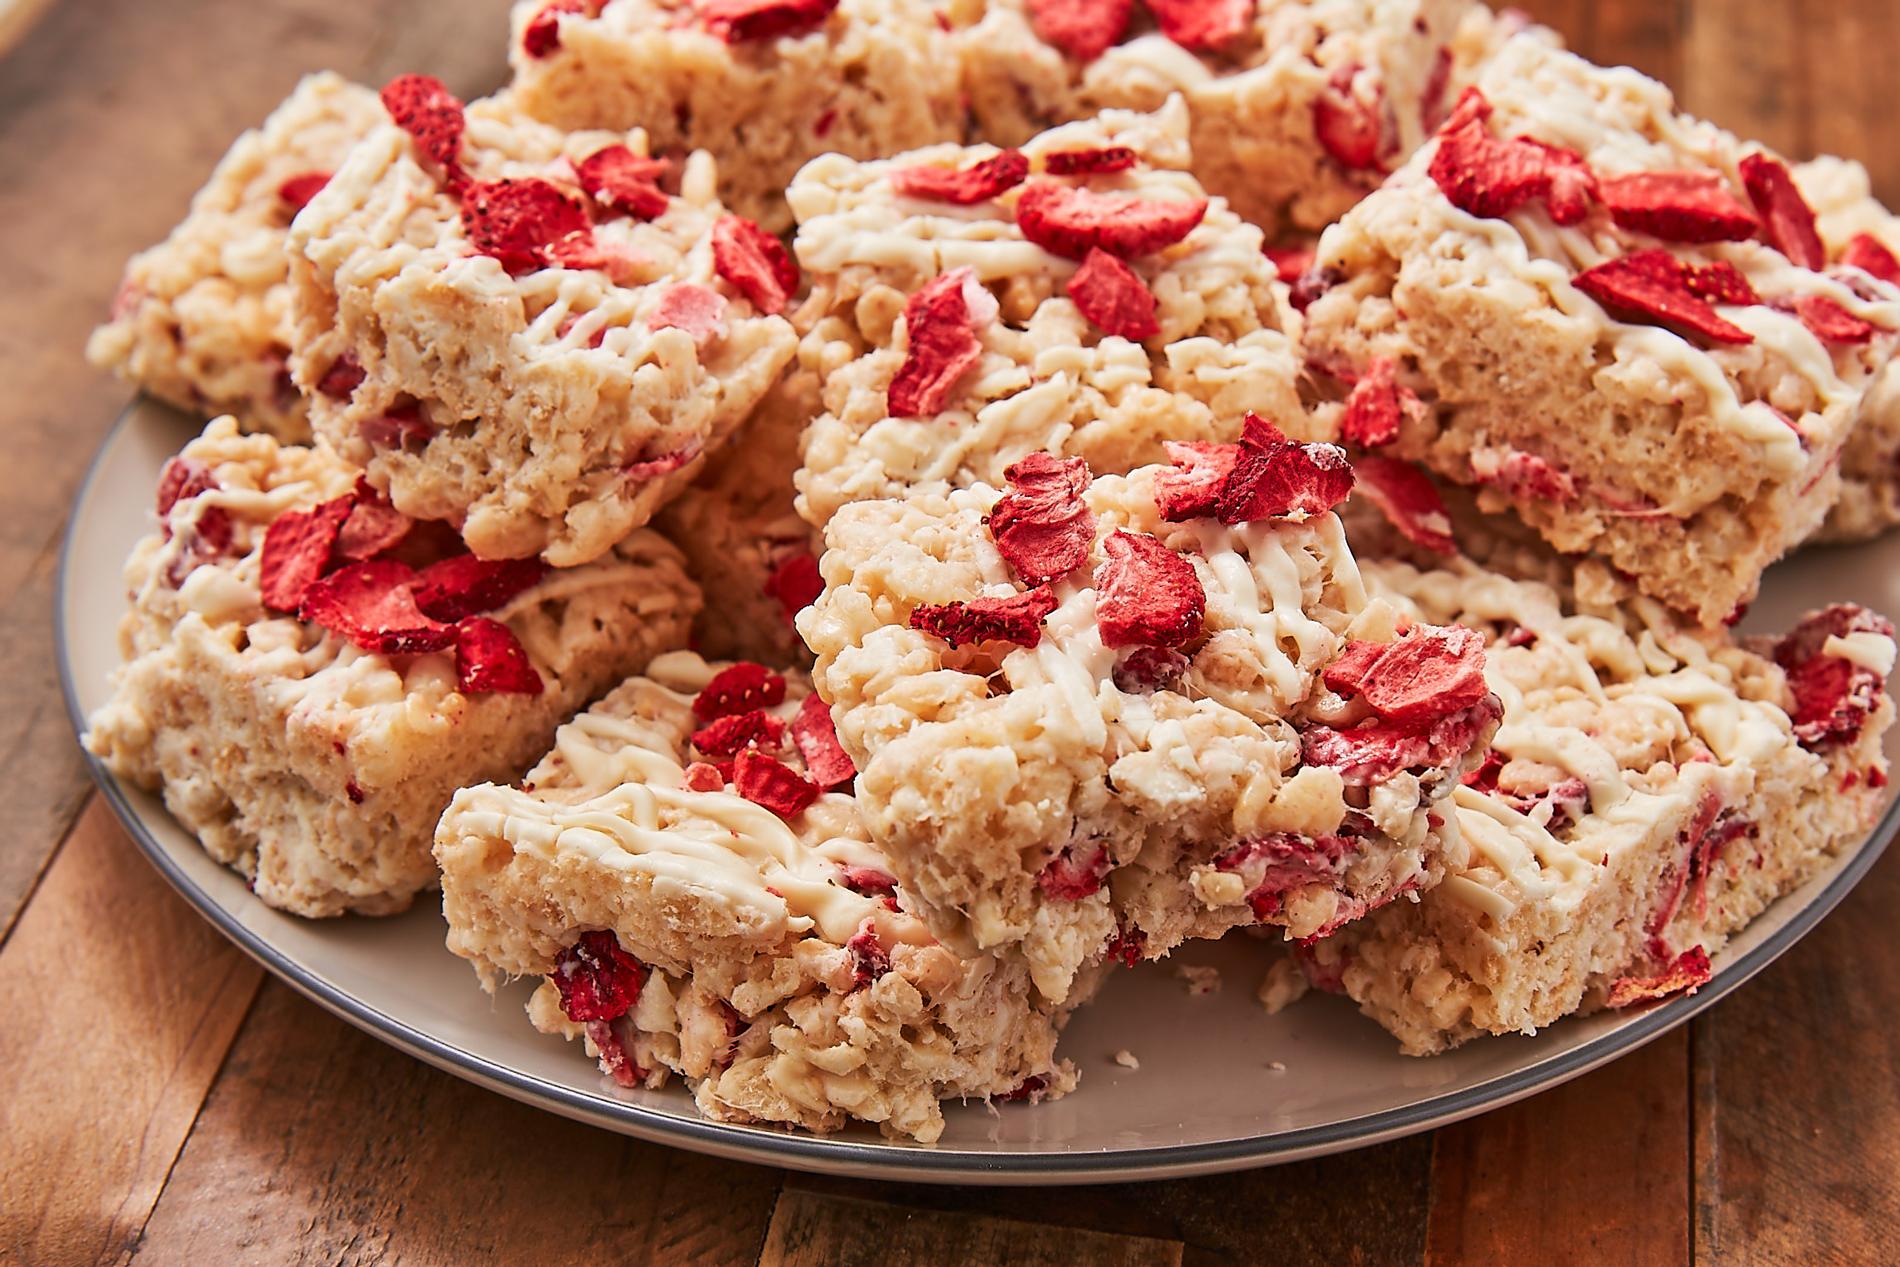 Strawberry Shortcake Rice Krispies Treats